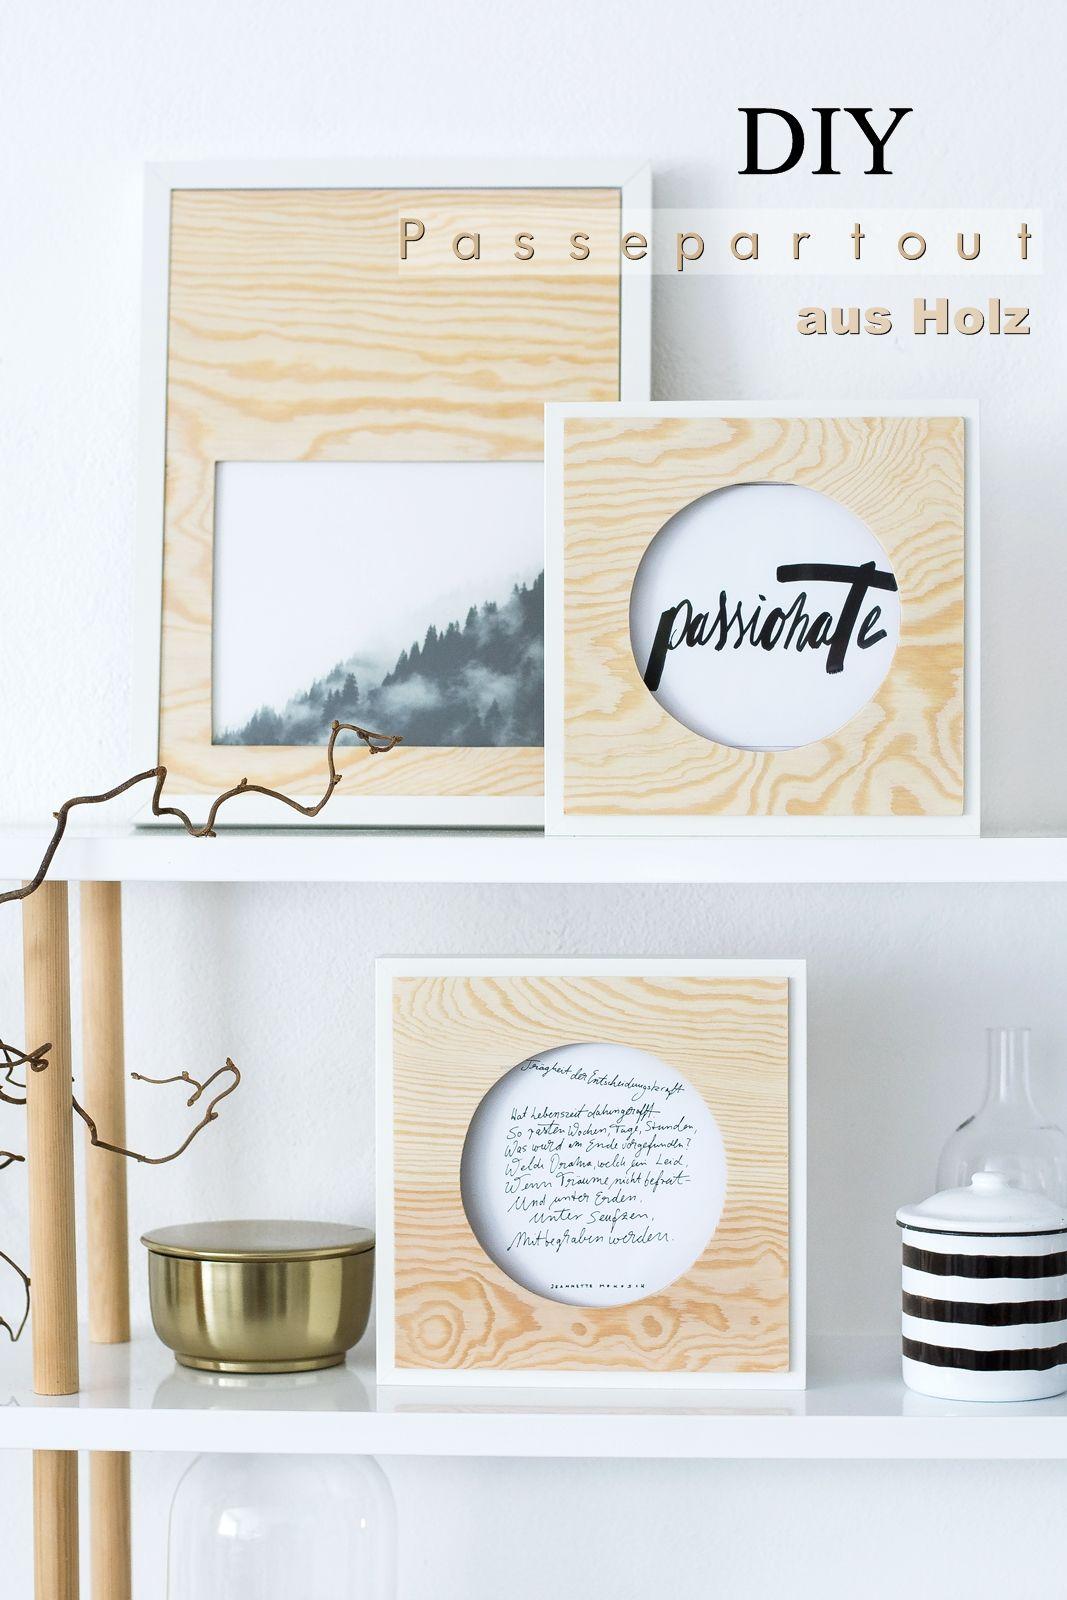 DIY - Quickie] Passepartout aus Holz | DIY | Pinterest | Holz ...